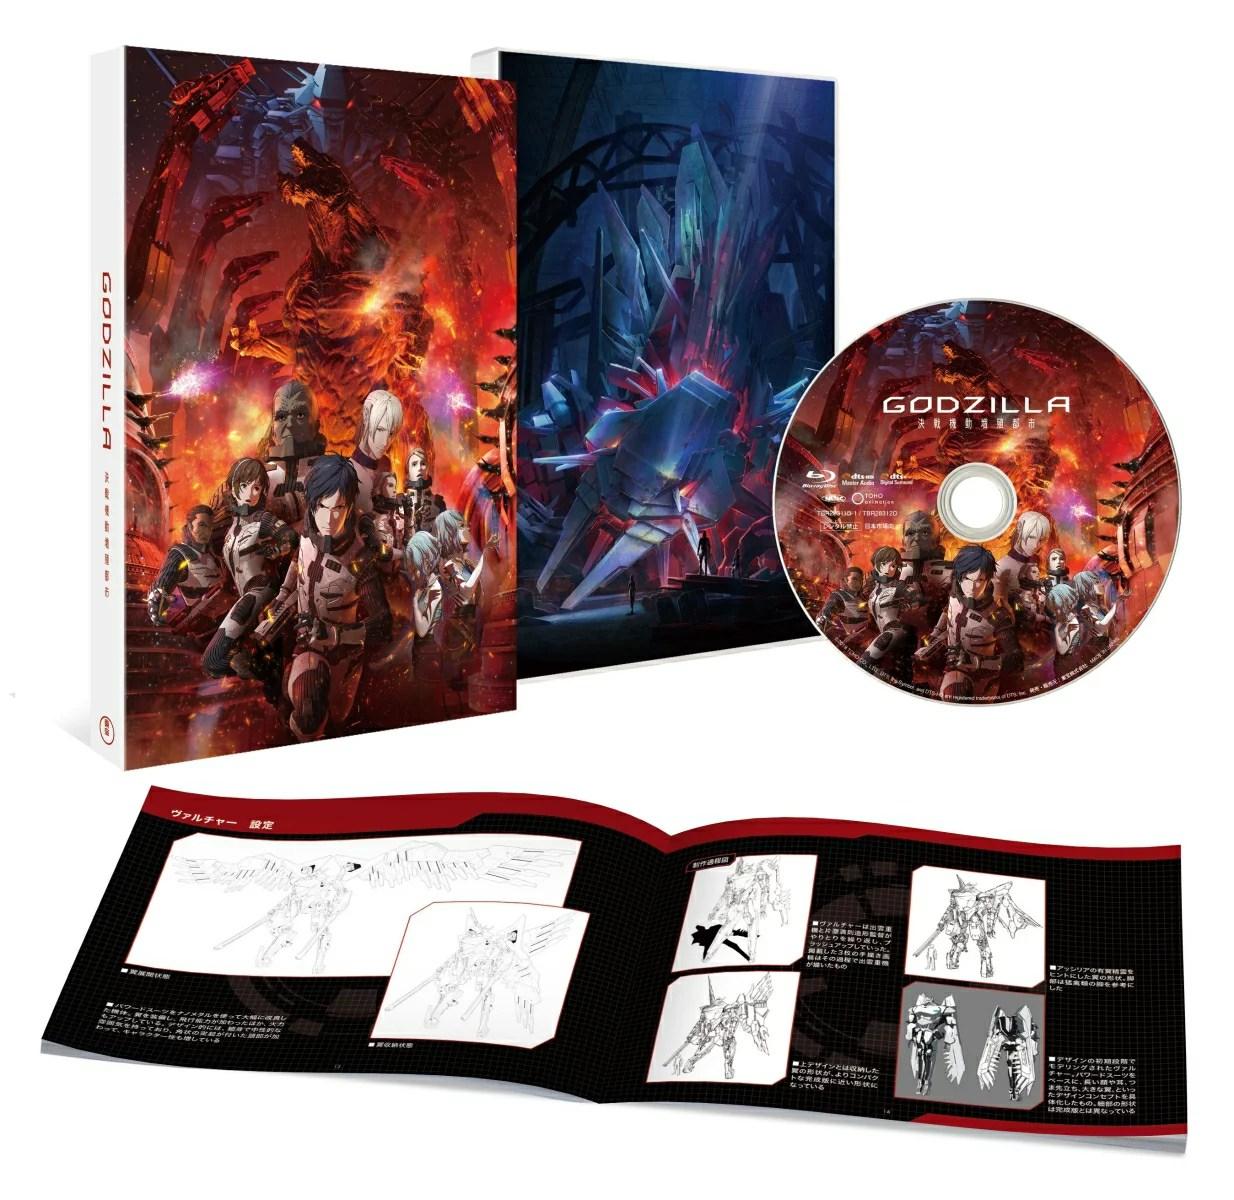 GODZILLA 決戦機動増殖都市 Blu-ray スタンダード・エディション【Blu-ray】 [